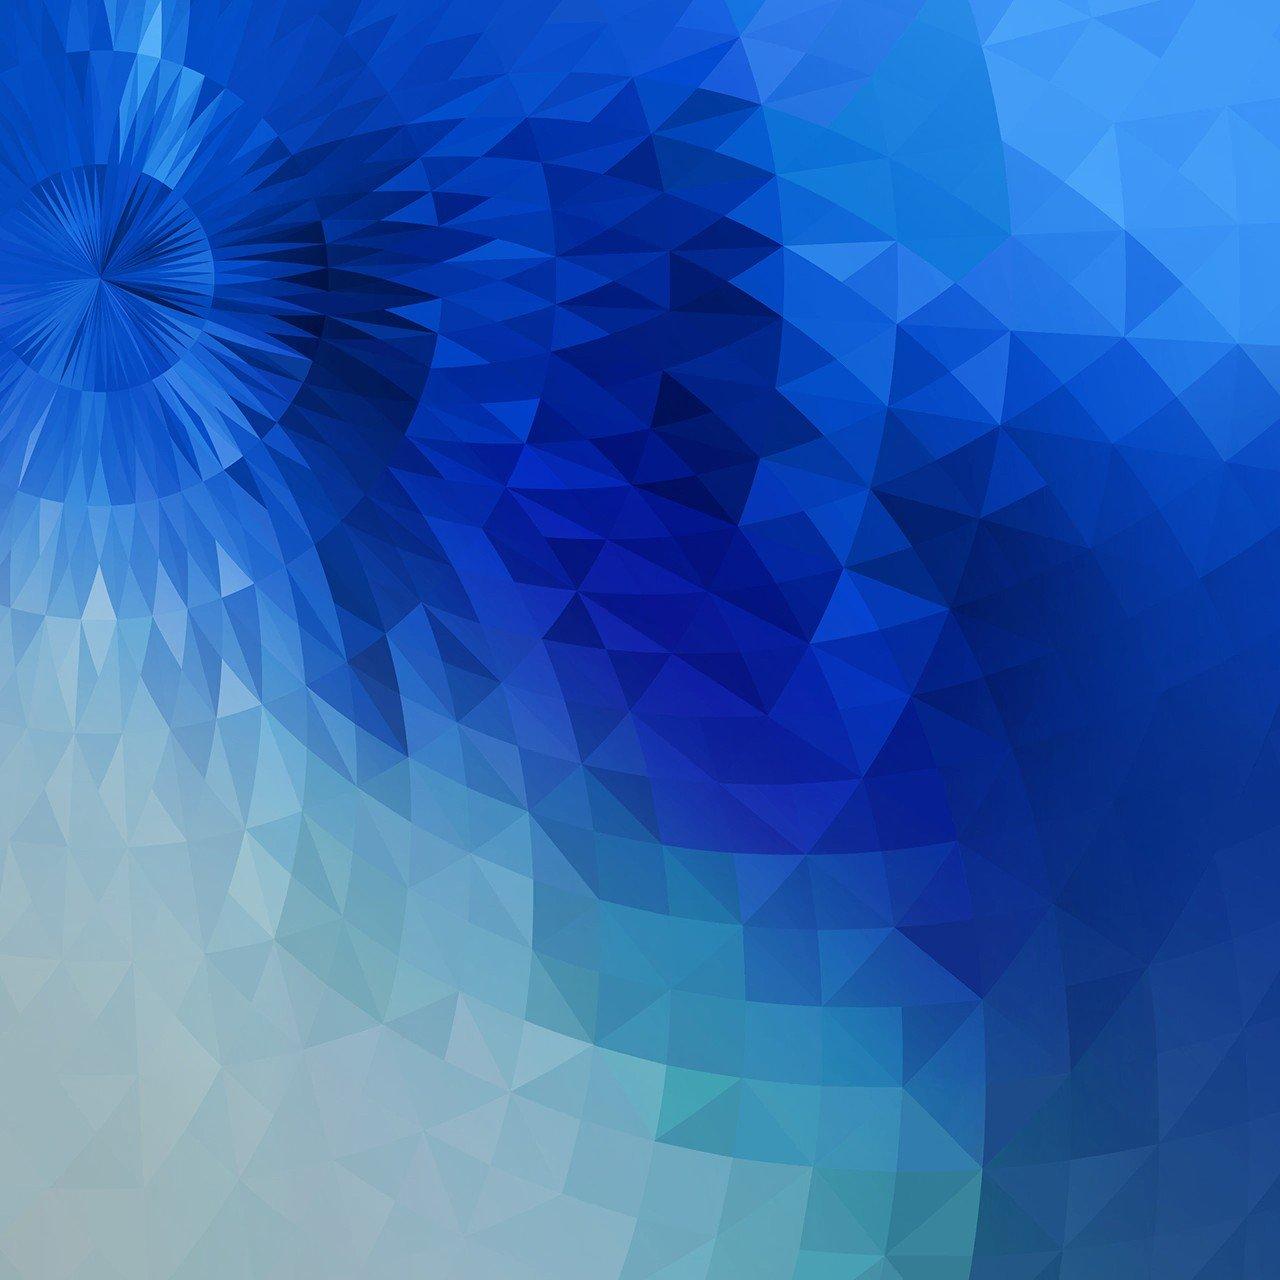 Samsung Galaxy J7 Star 1280x1280 Download Hd Wallpaper Wallpapertip